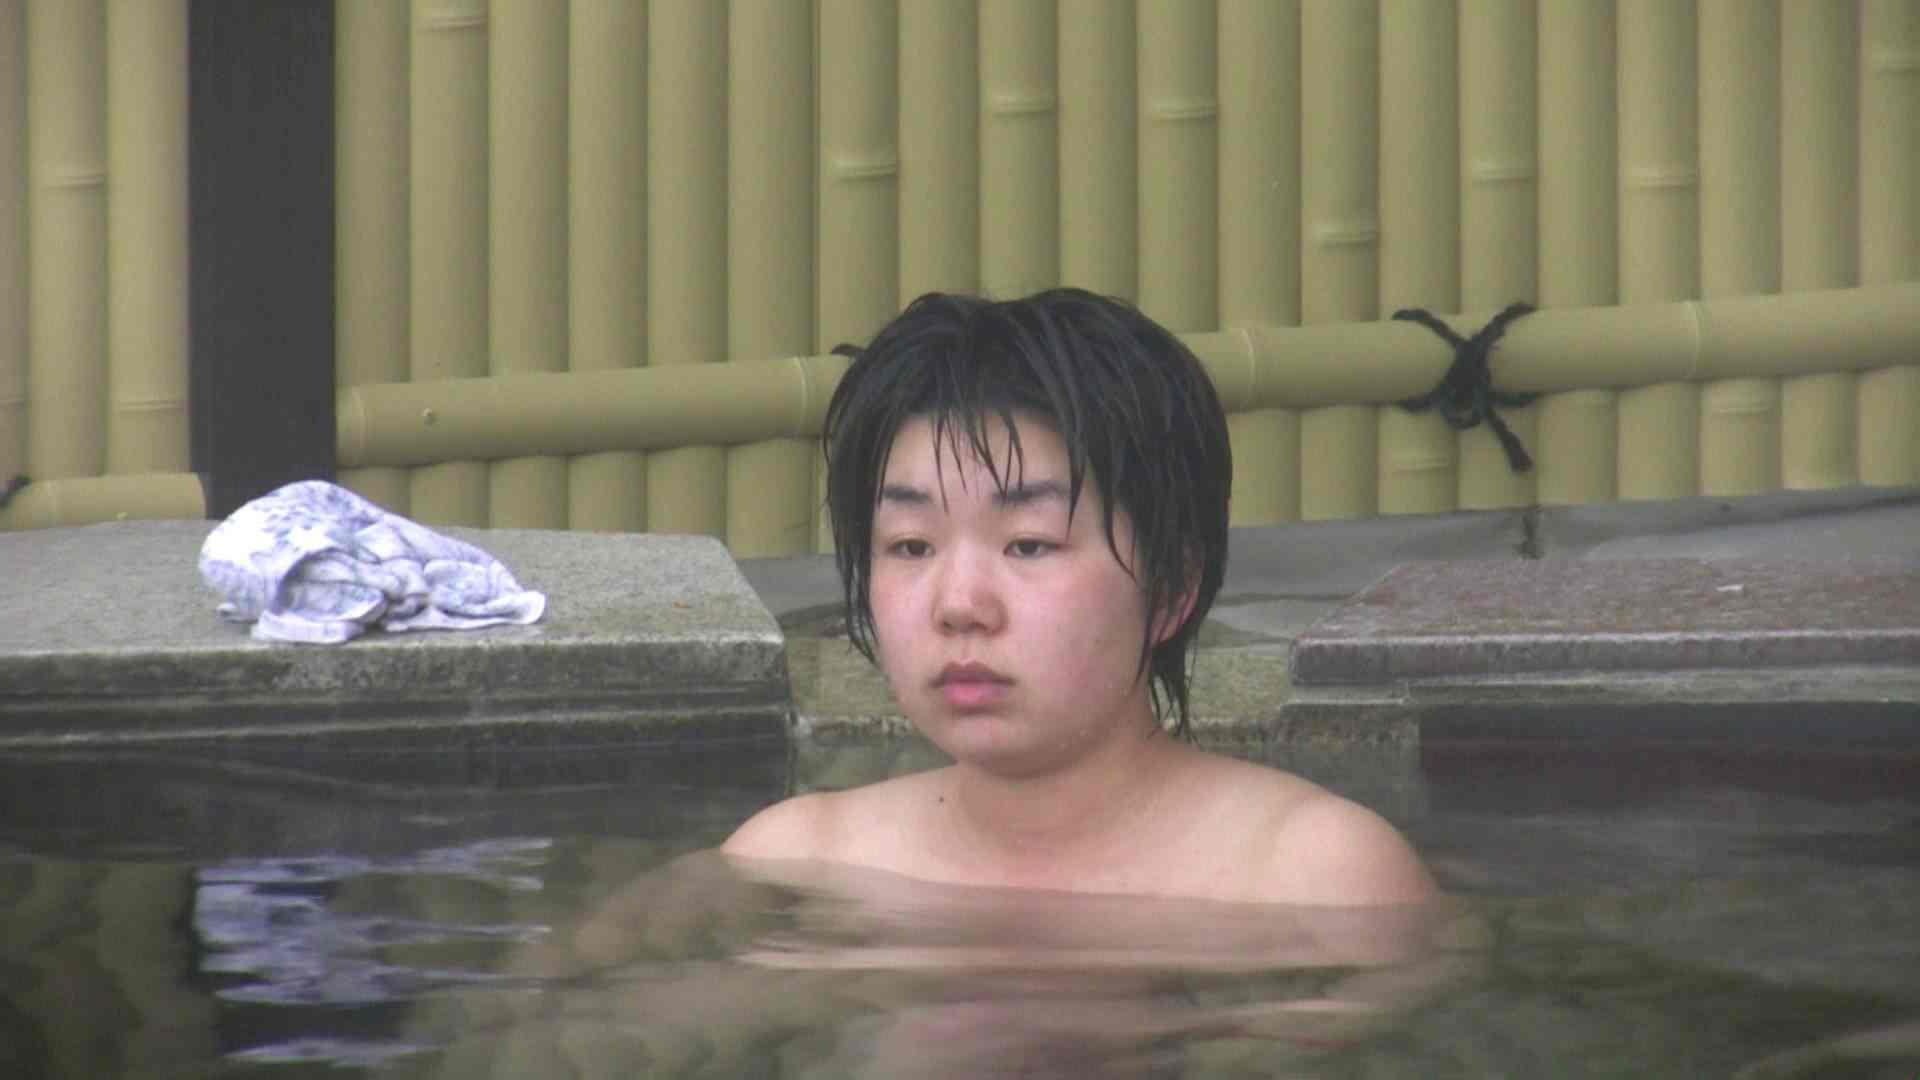 Aquaな露天風呂Vol.53【VIP限定】 盗撮大放出 ヌード画像 68連発 13